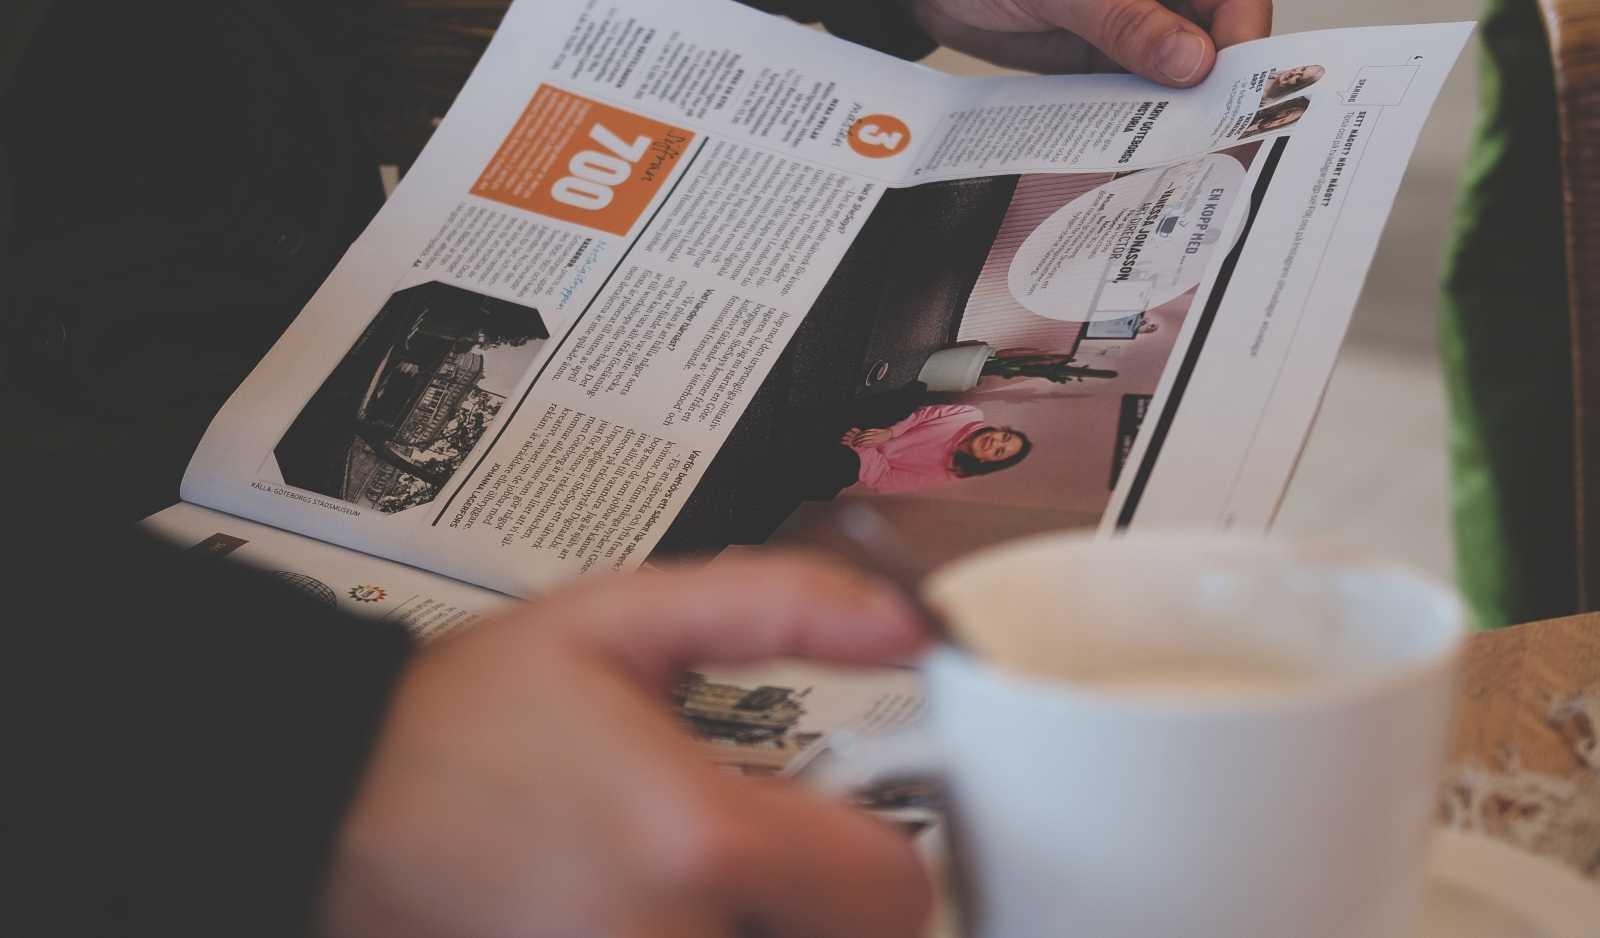 Coffee and Swedish Newspaper